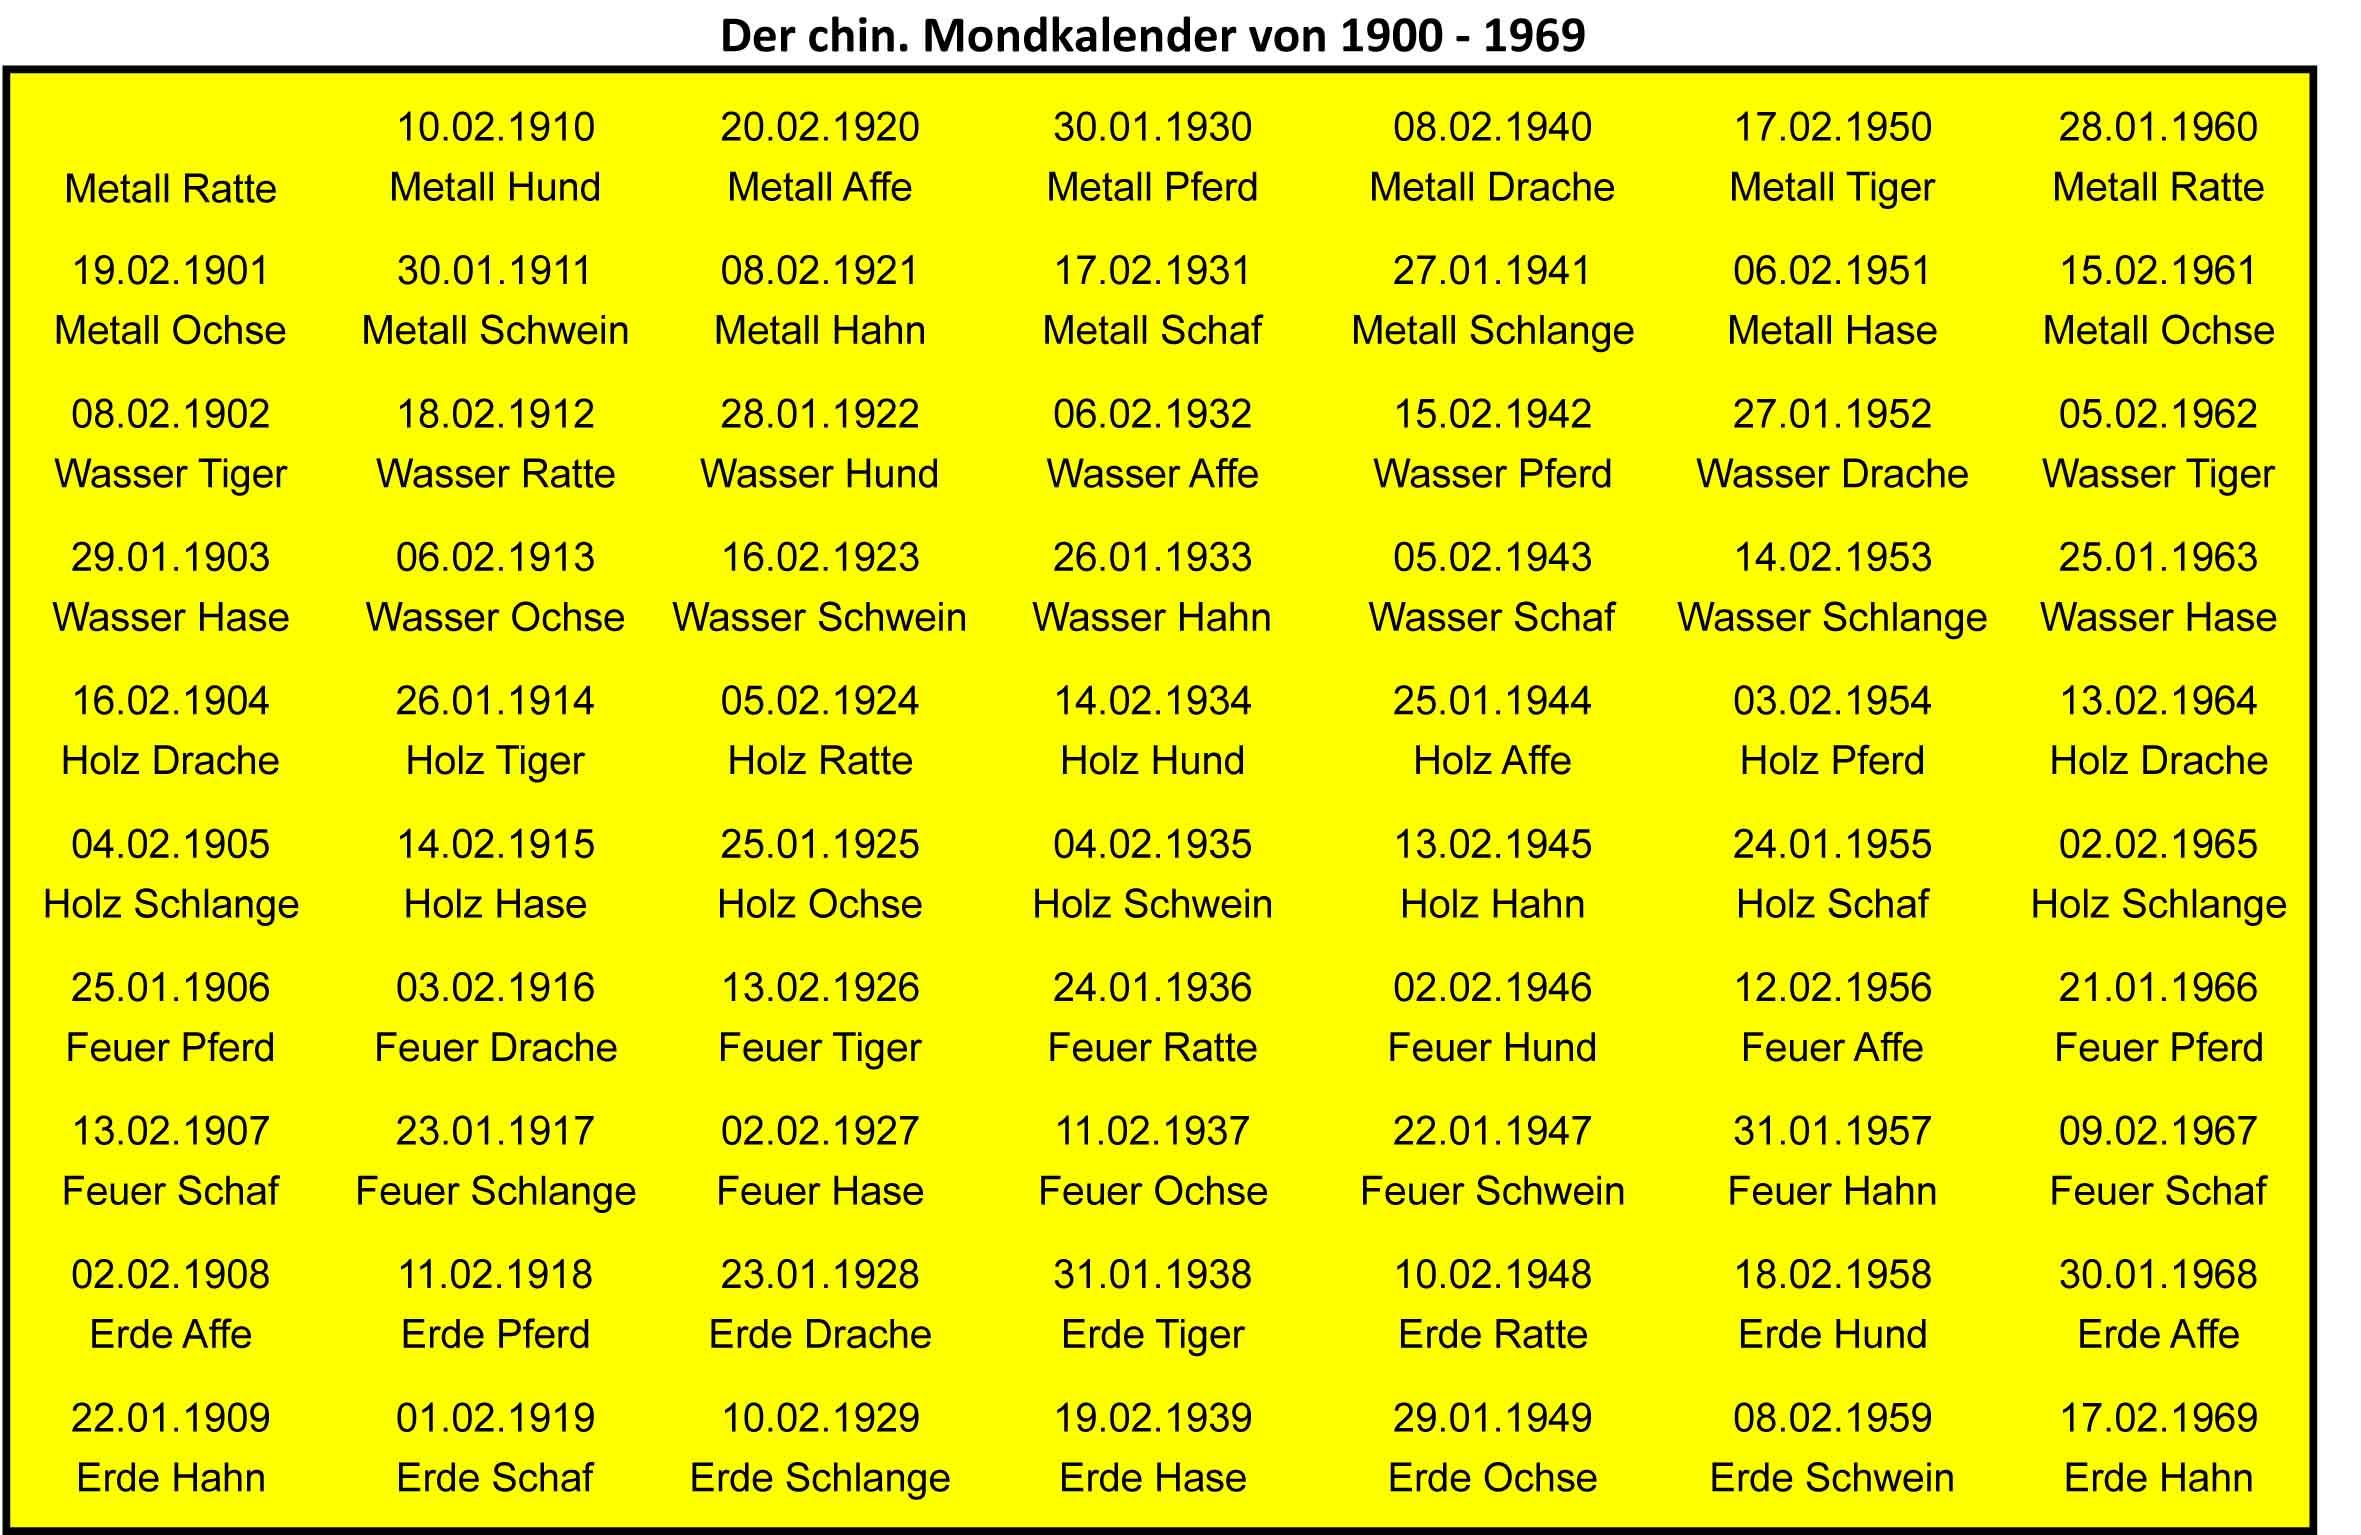 Mond-Kalender 1900-1969